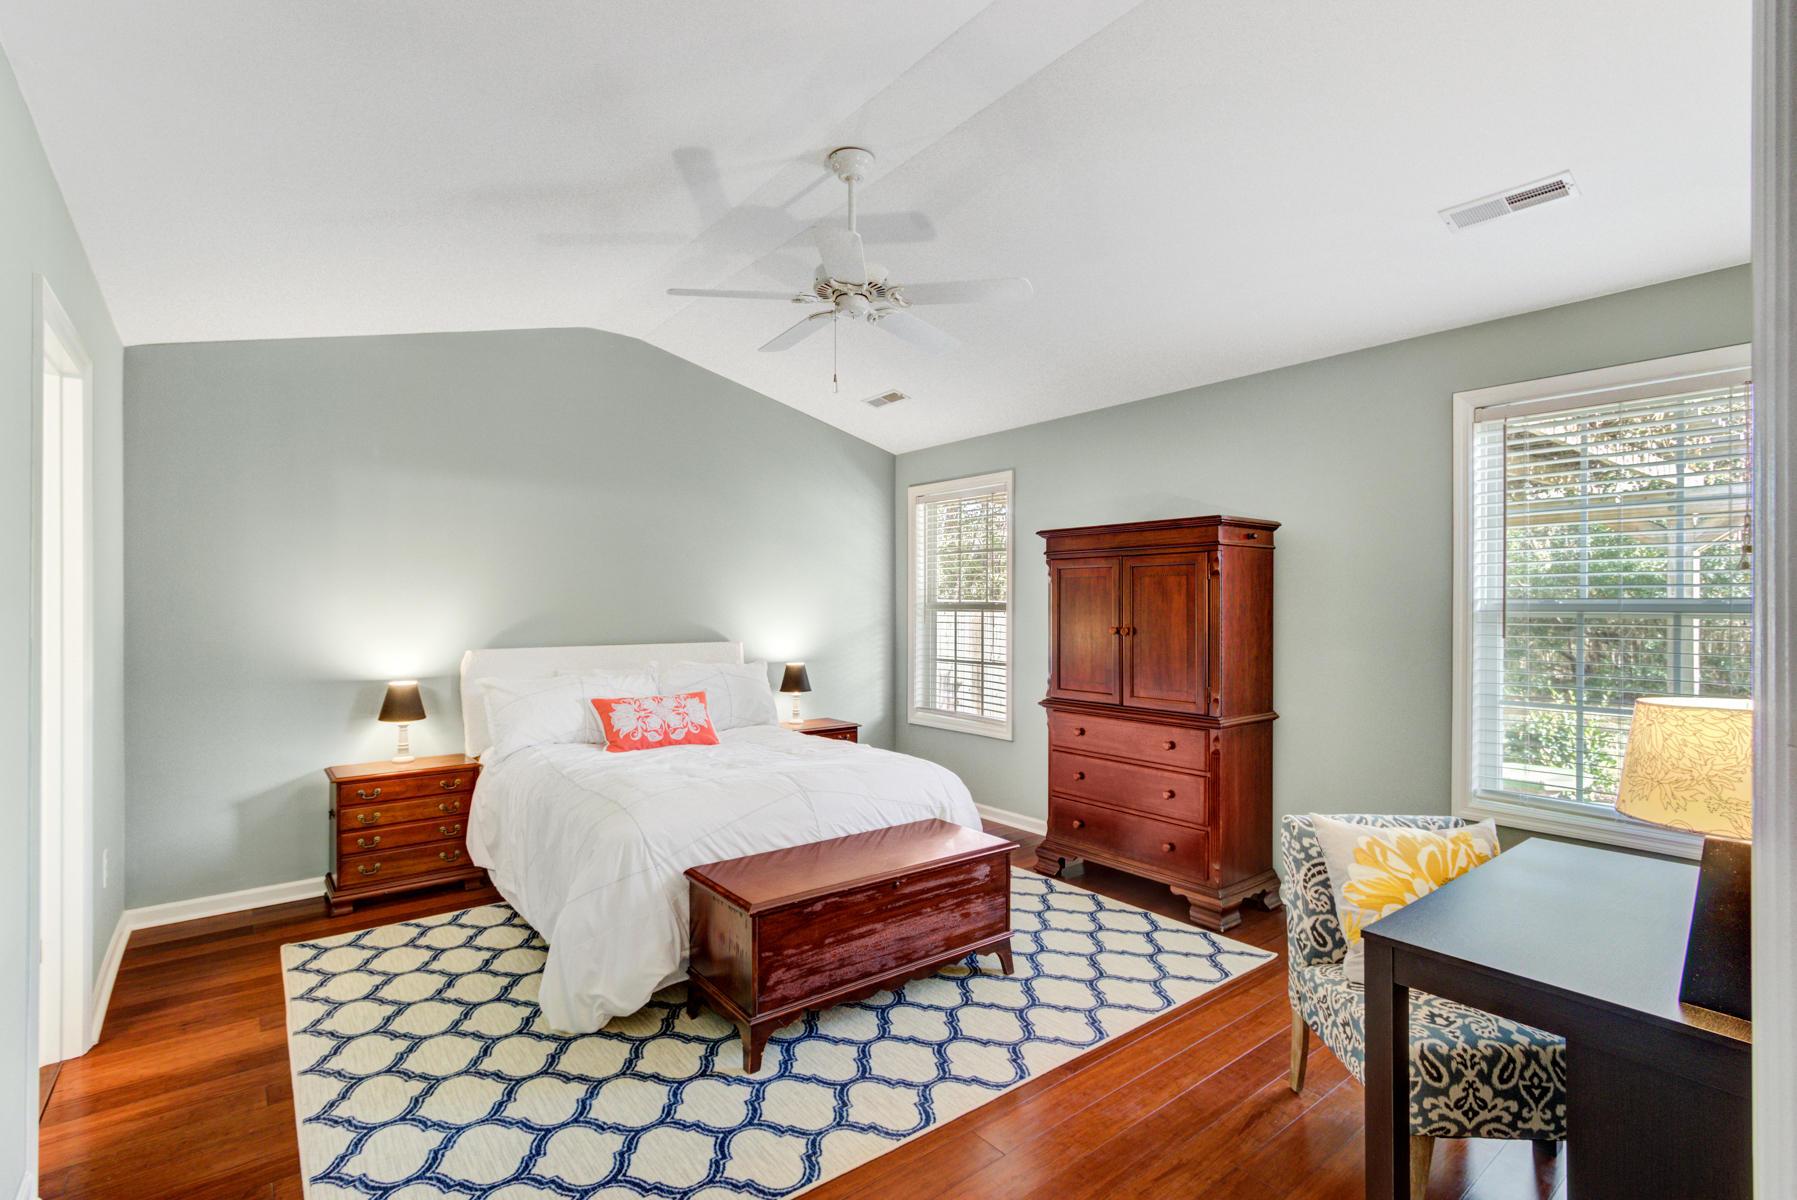 Park West Homes For Sale - 3444 Wellesley, Mount Pleasant, SC - 11